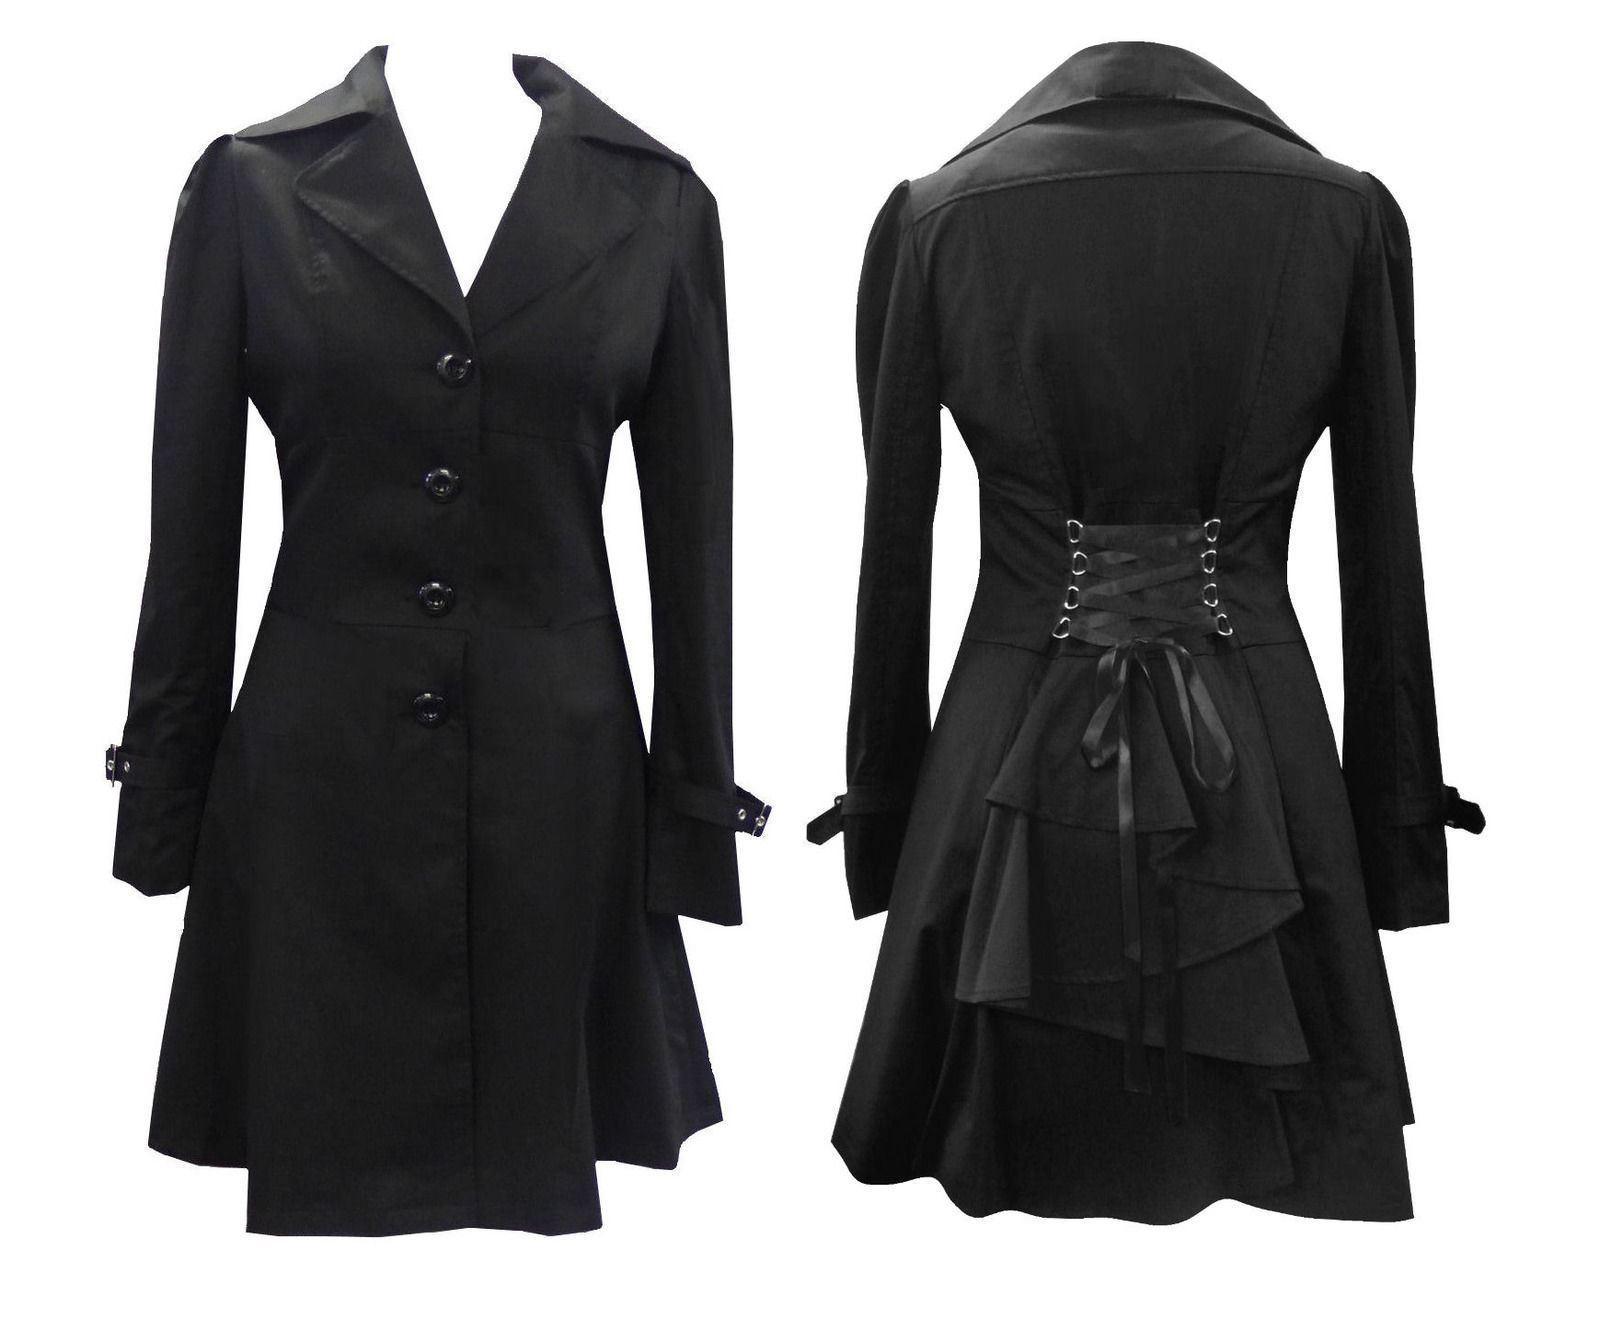 rebelsmarket_women_gothic_victorian_corset_riding_jacket_black_gothic_steampunk_coat__coats_6.jpg